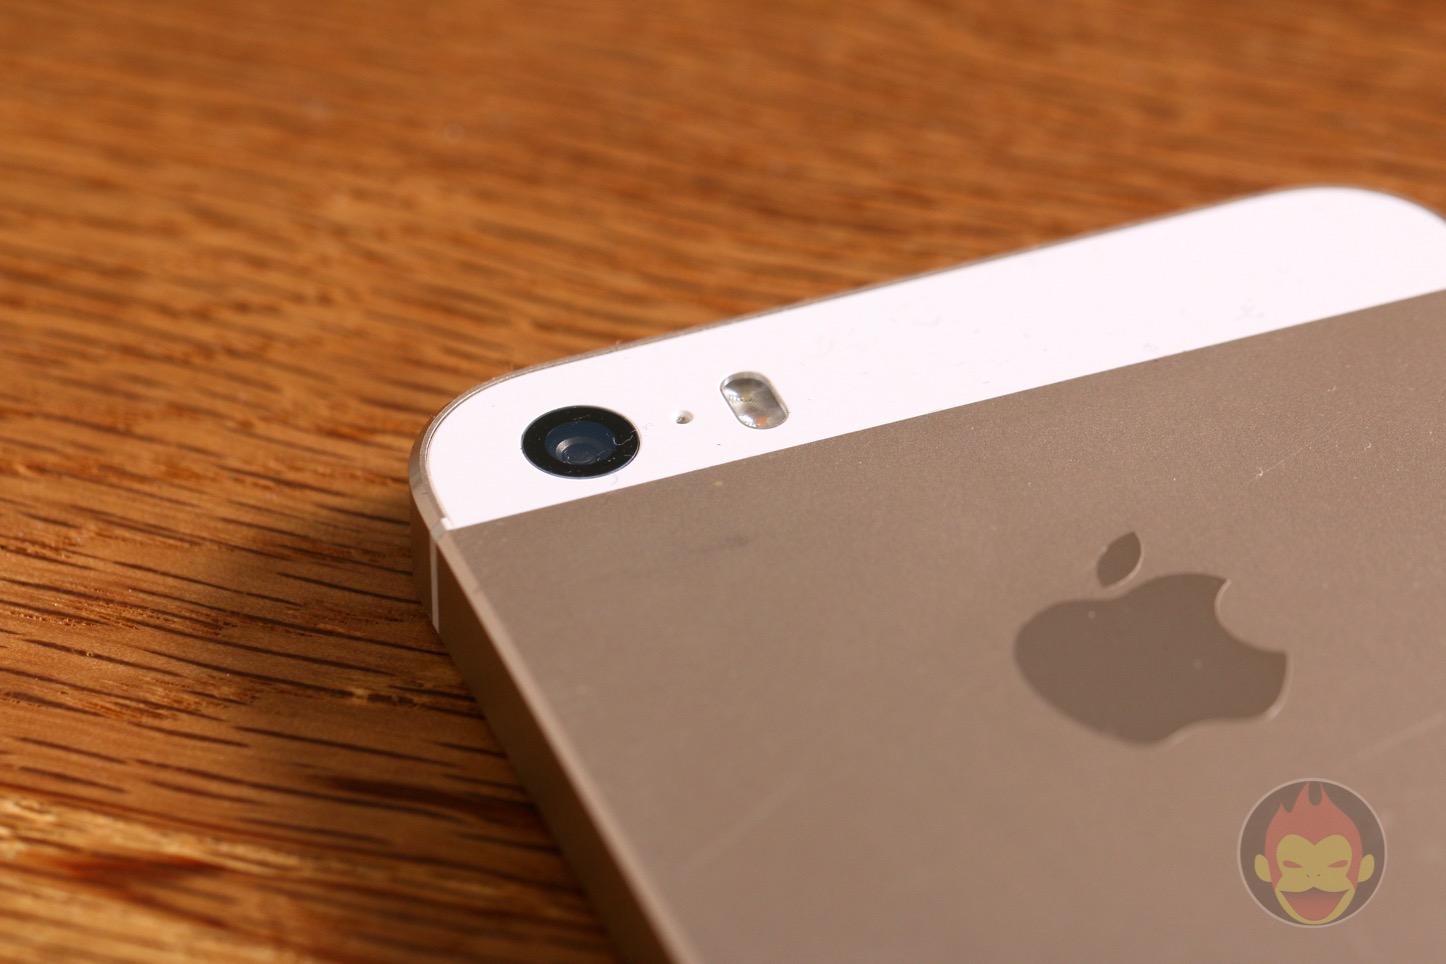 IPhone 5s Photo Camera